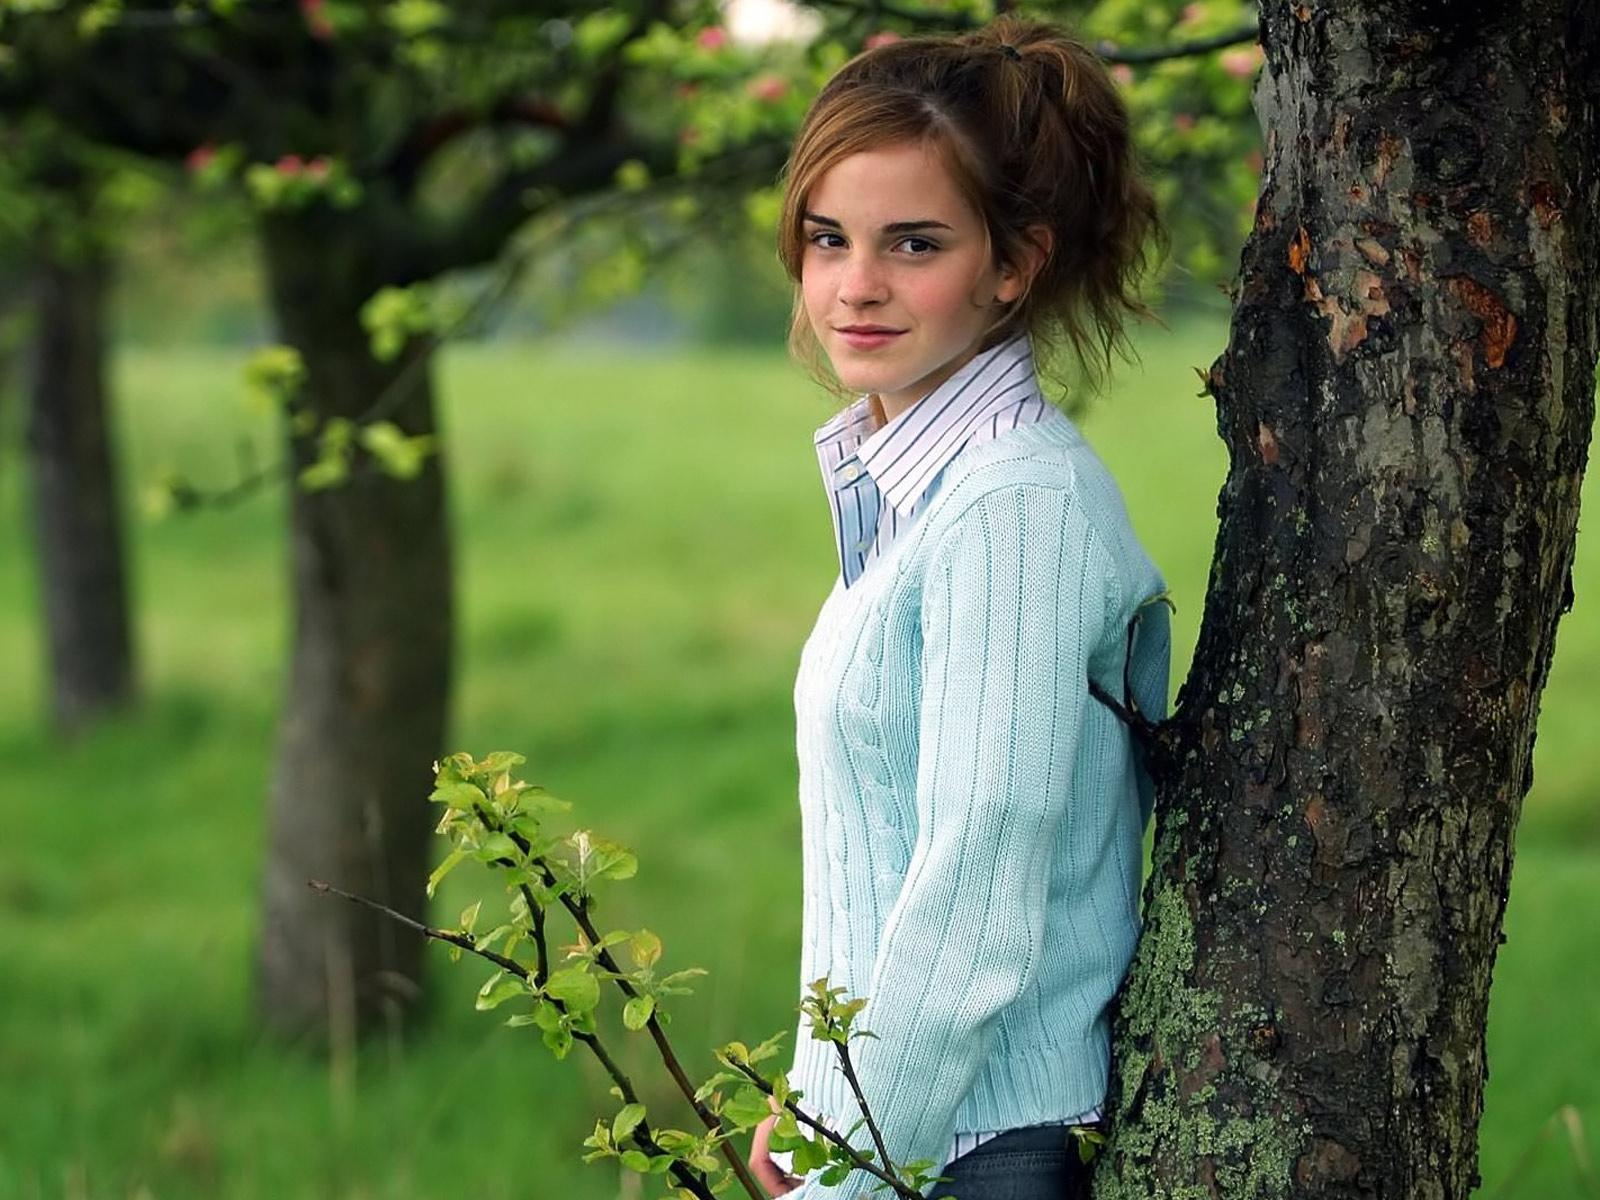 http://2.bp.blogspot.com/_tz9SkM7NCRM/TOBWJlxKCBI/AAAAAAAAAVc/1Z_OYukme5w/s1600/Emma_Watson_British_actress.jpg